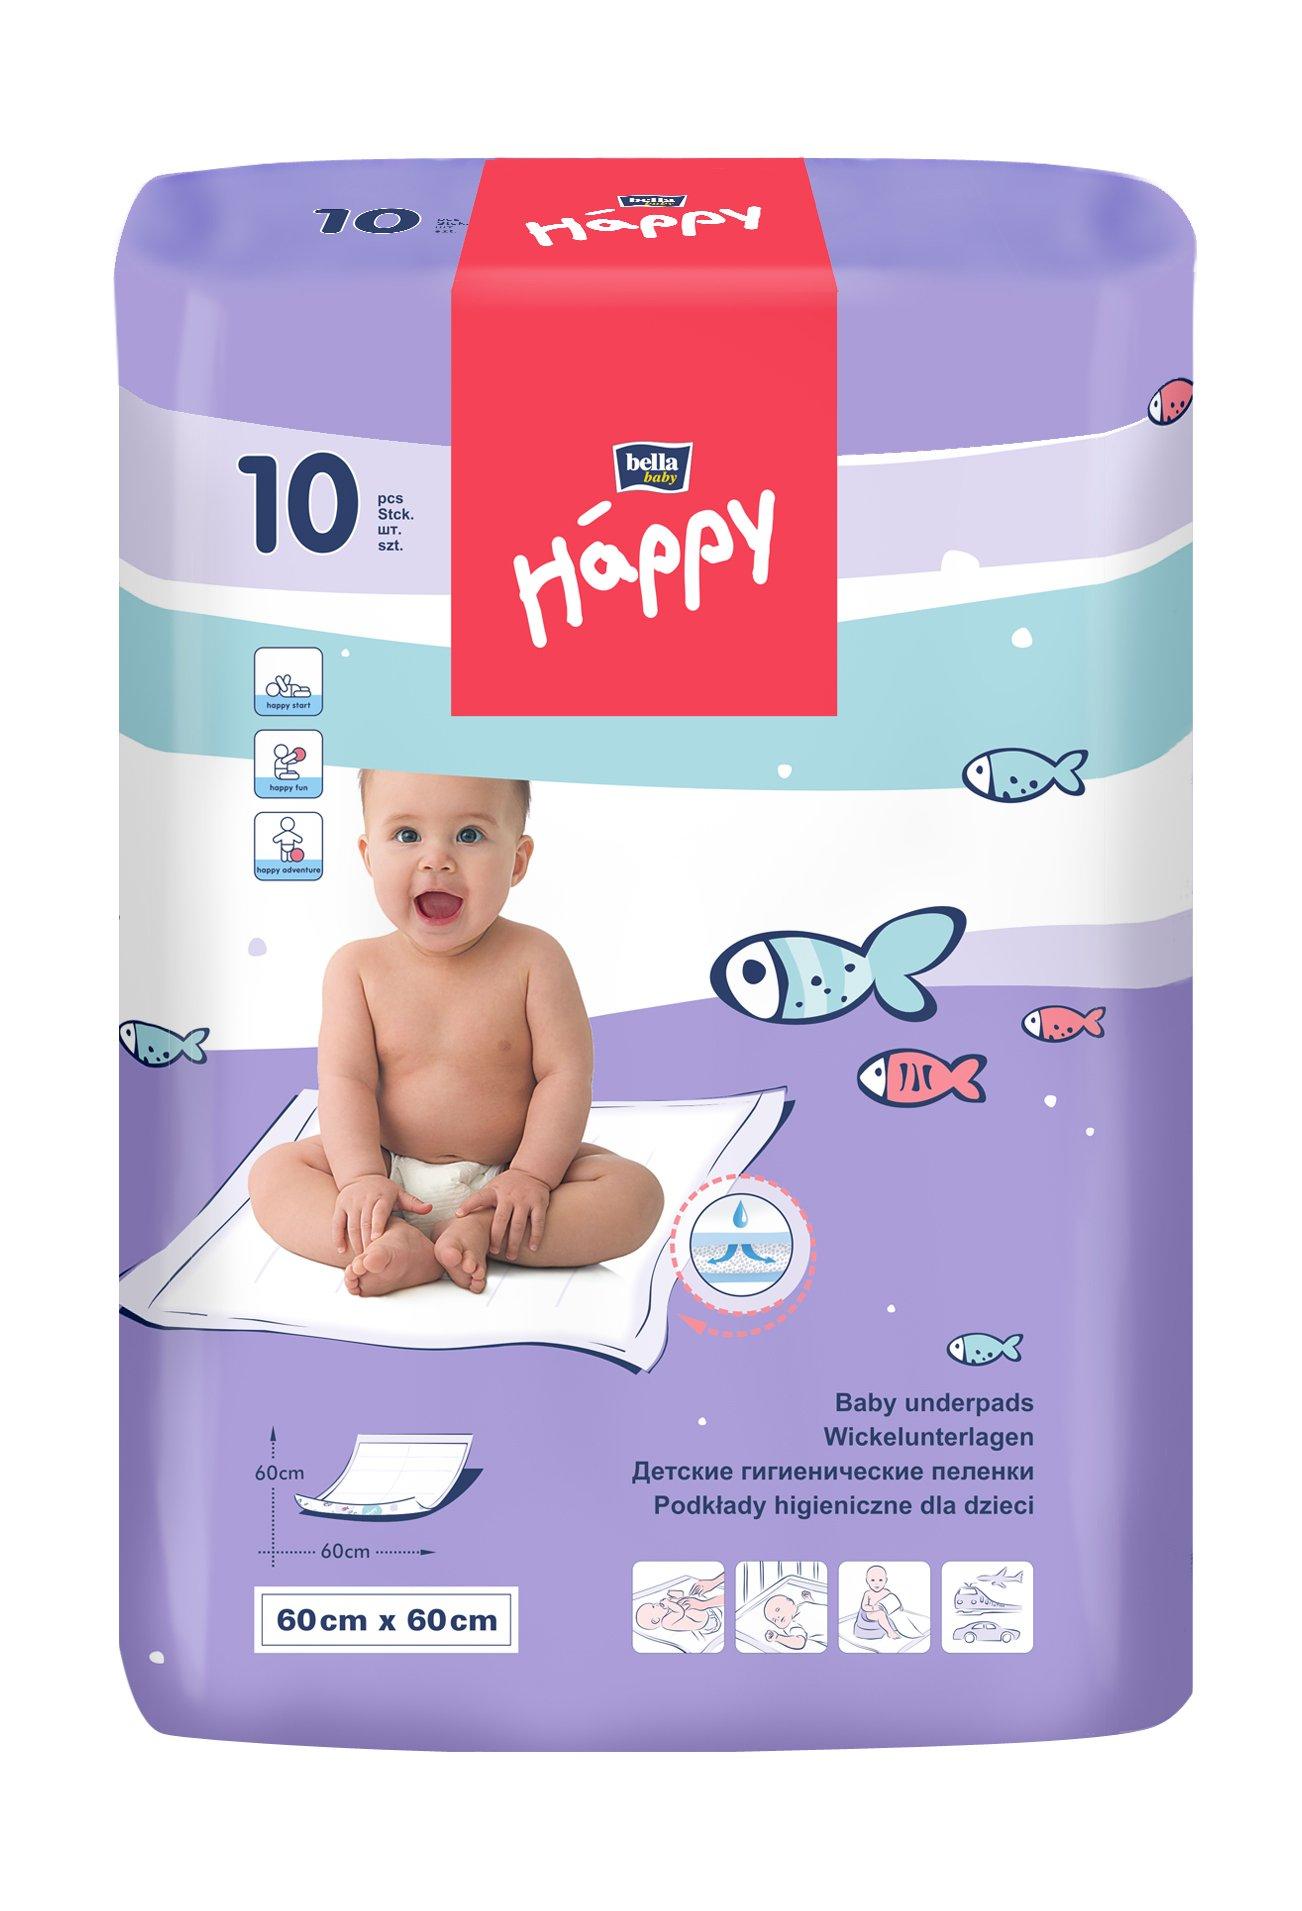 Bella bambino felice fasciatoi 60 x 60 cm, 4-Pack (4 x 10 pezzi)